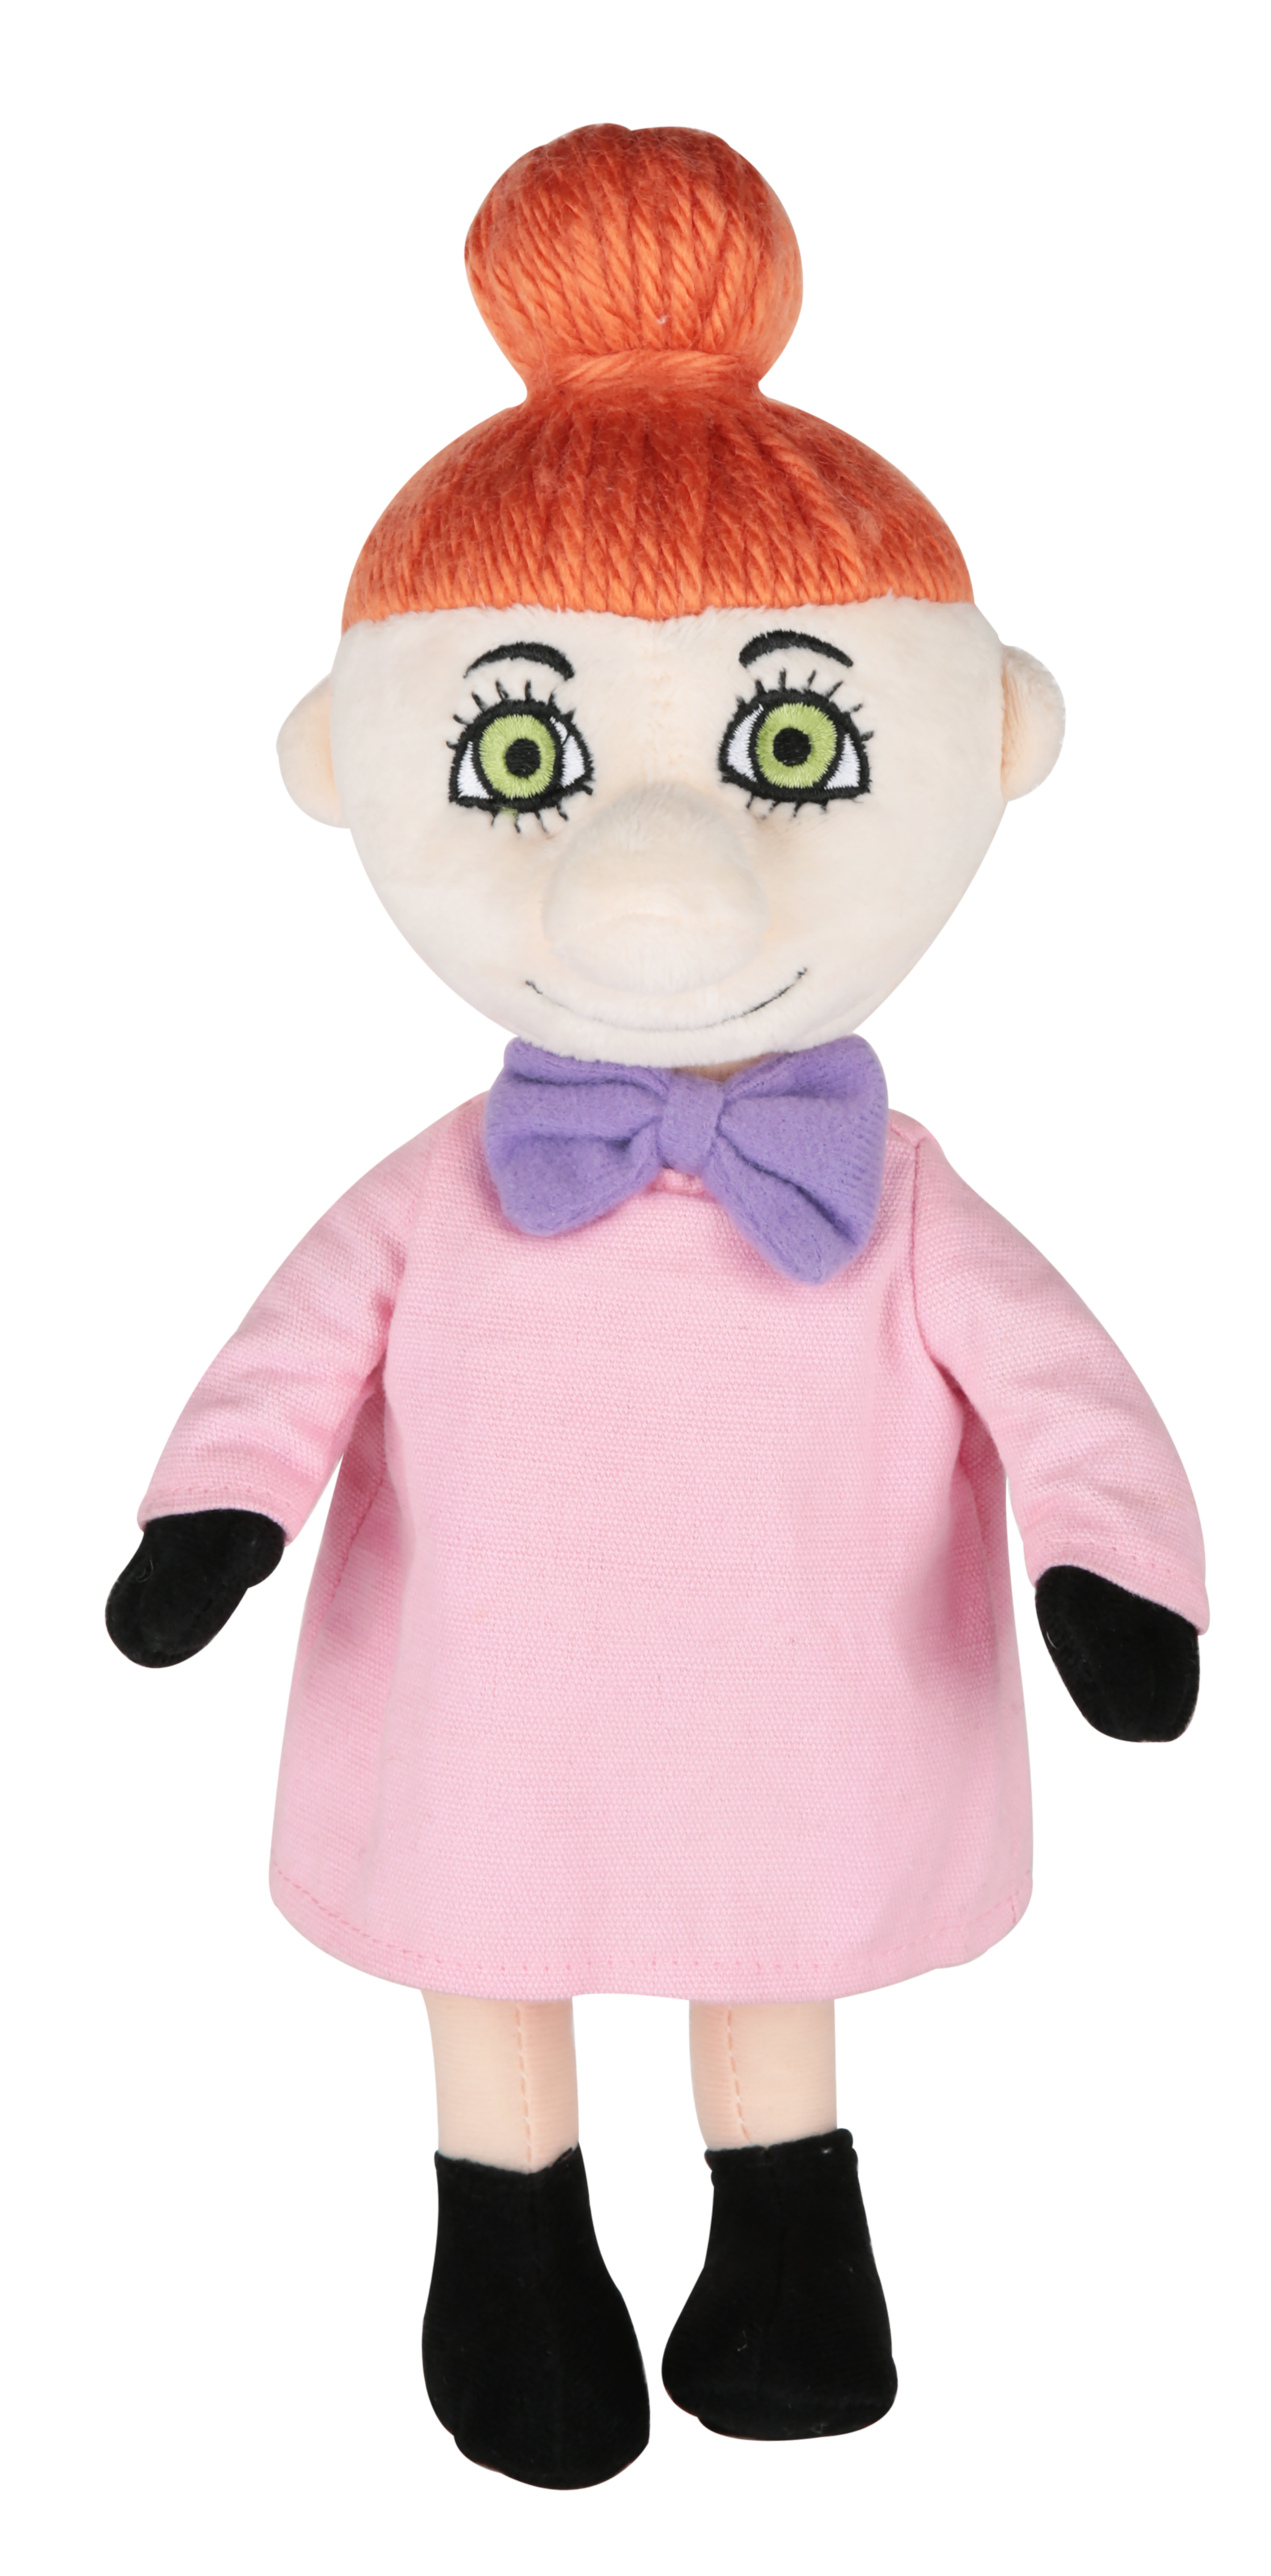 Martinex Moomin Mymble 30cm